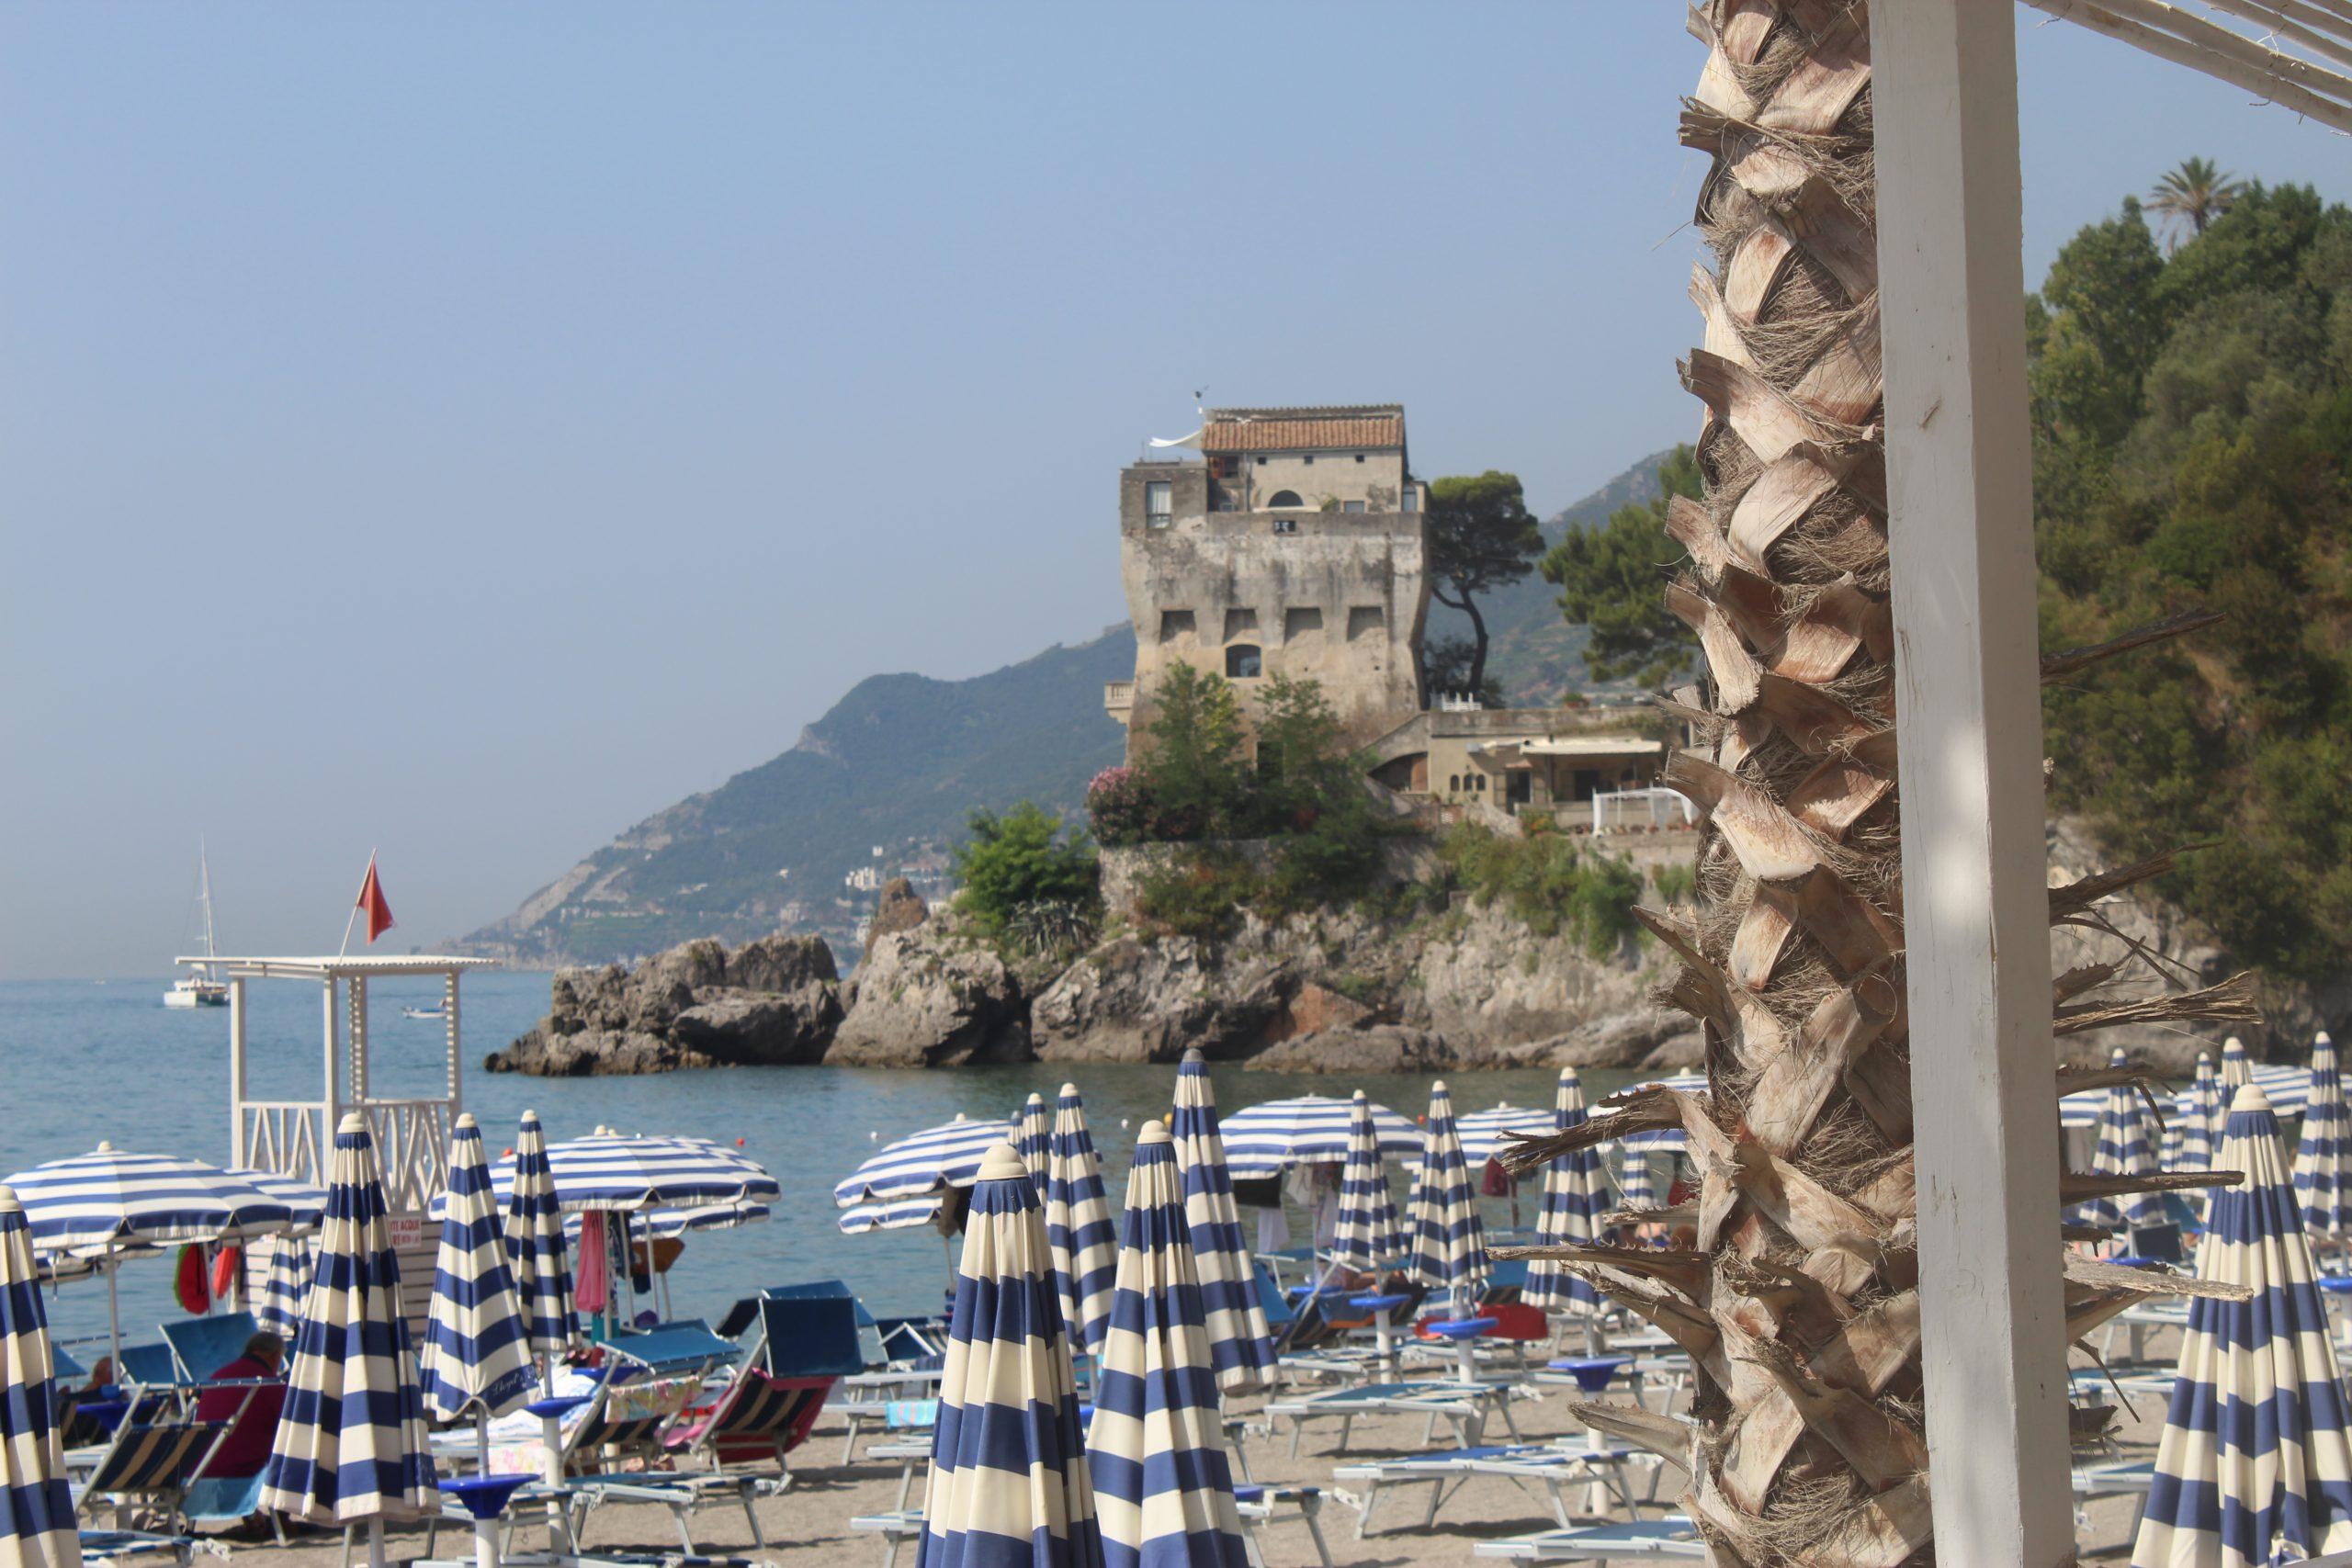 Italian Staycation Travel Tips Gucci Look Be Italian Details Paola Lauretano